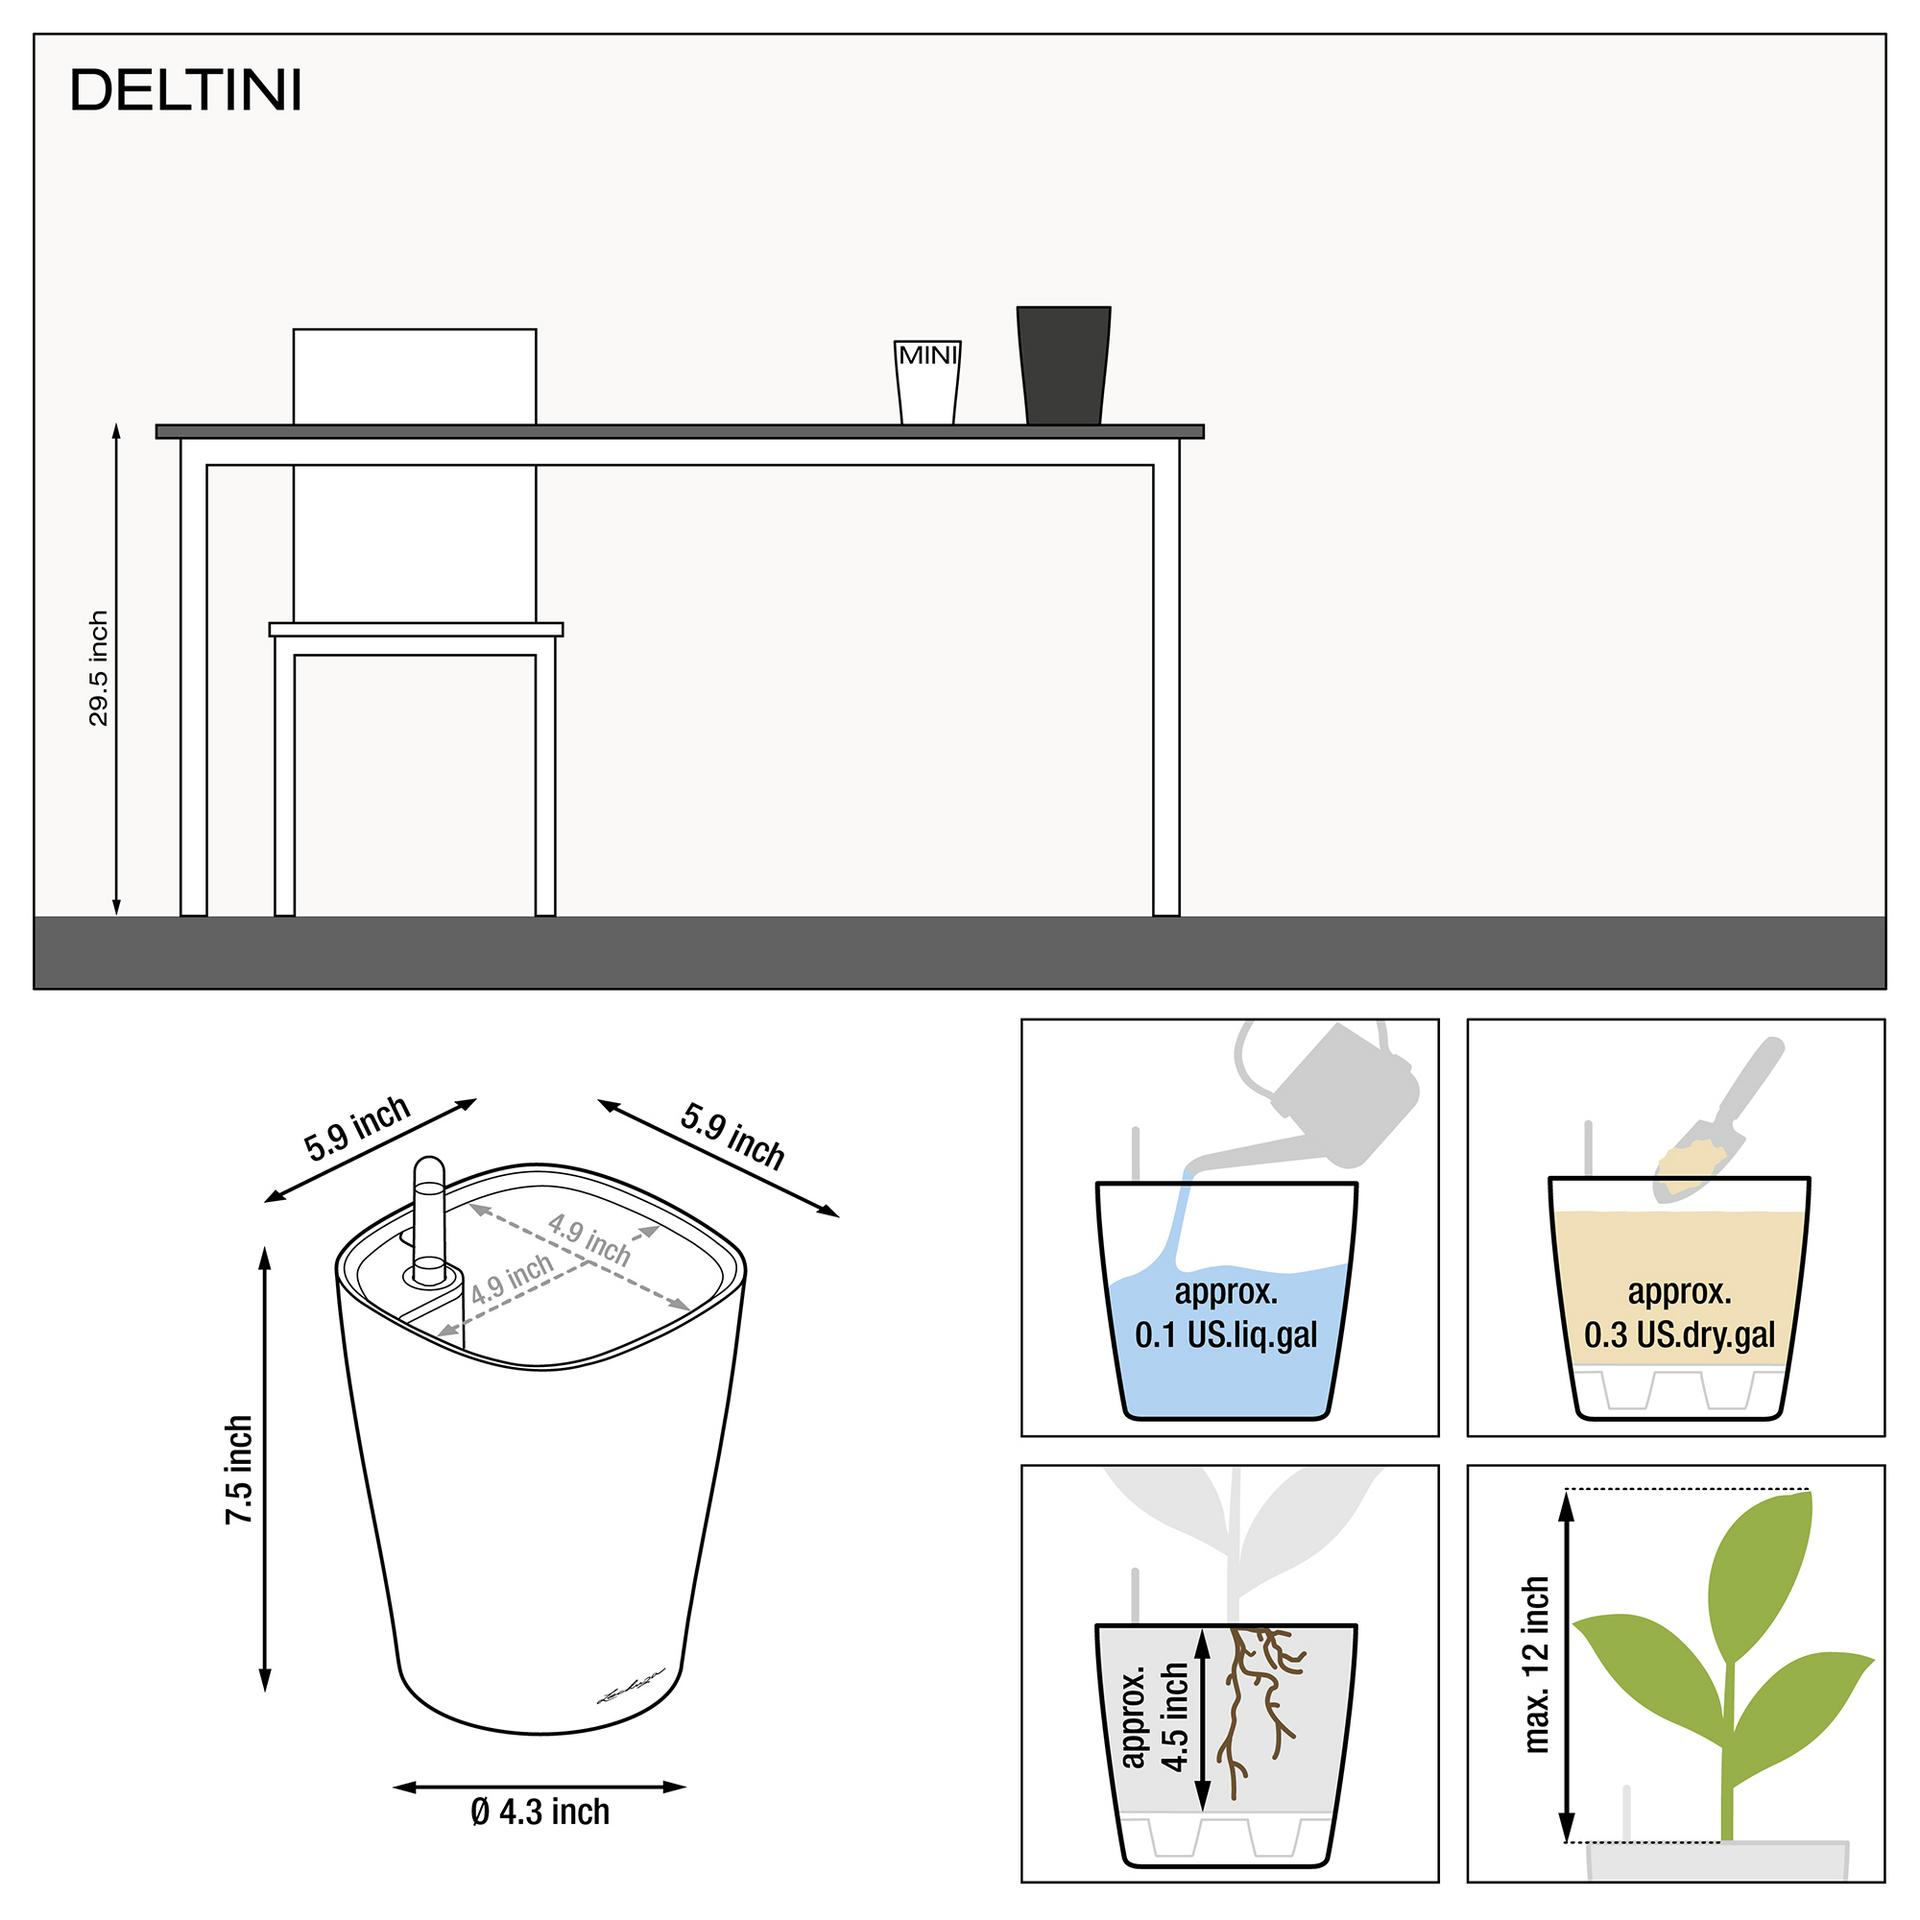 le_deltini-14_product_addi_nz_us